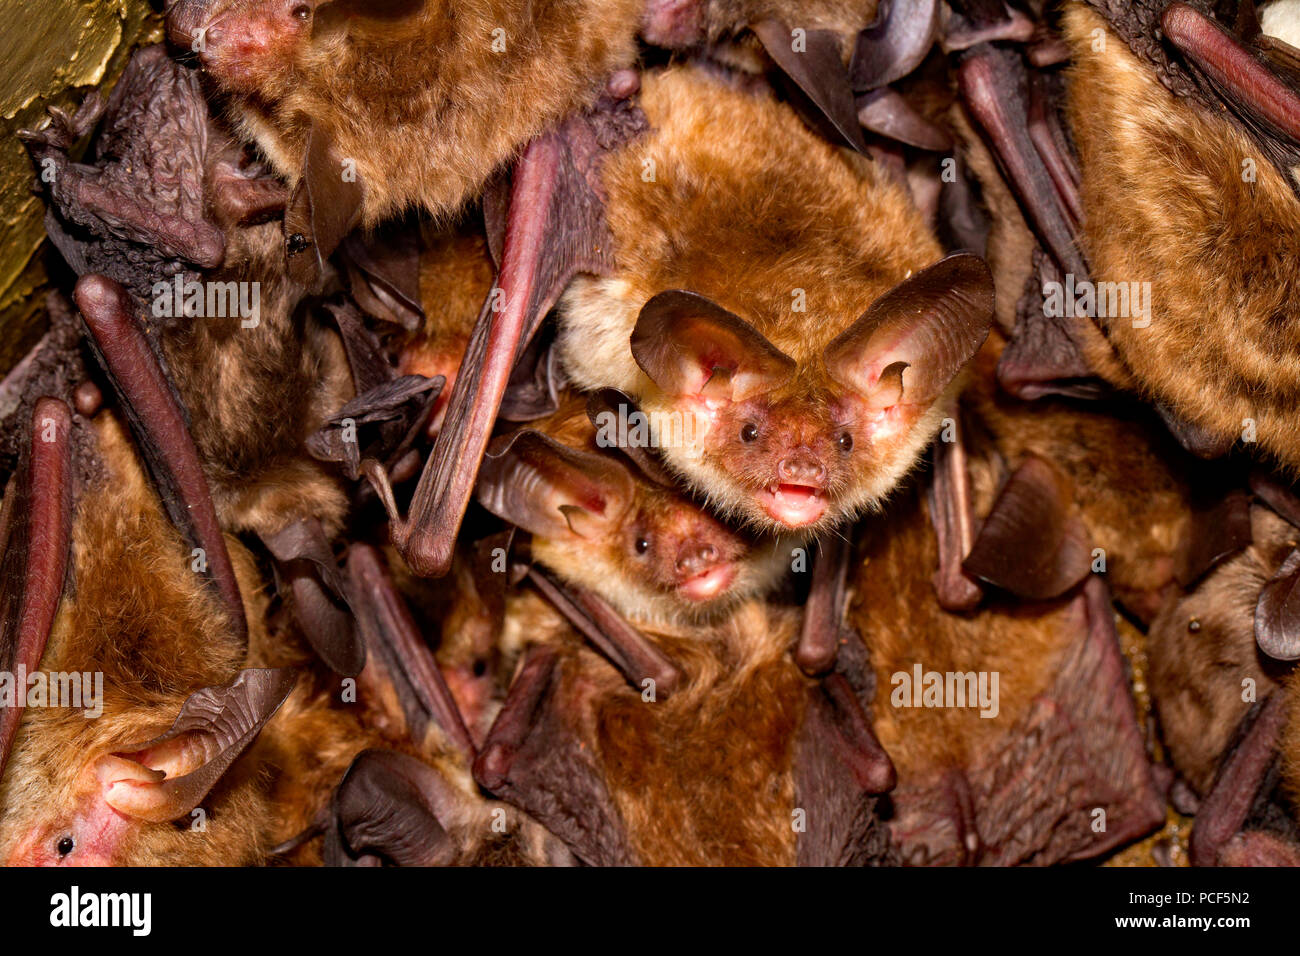 Les chauves-souris, du bechstein (Myotis bechsteinii) Banque D'Images